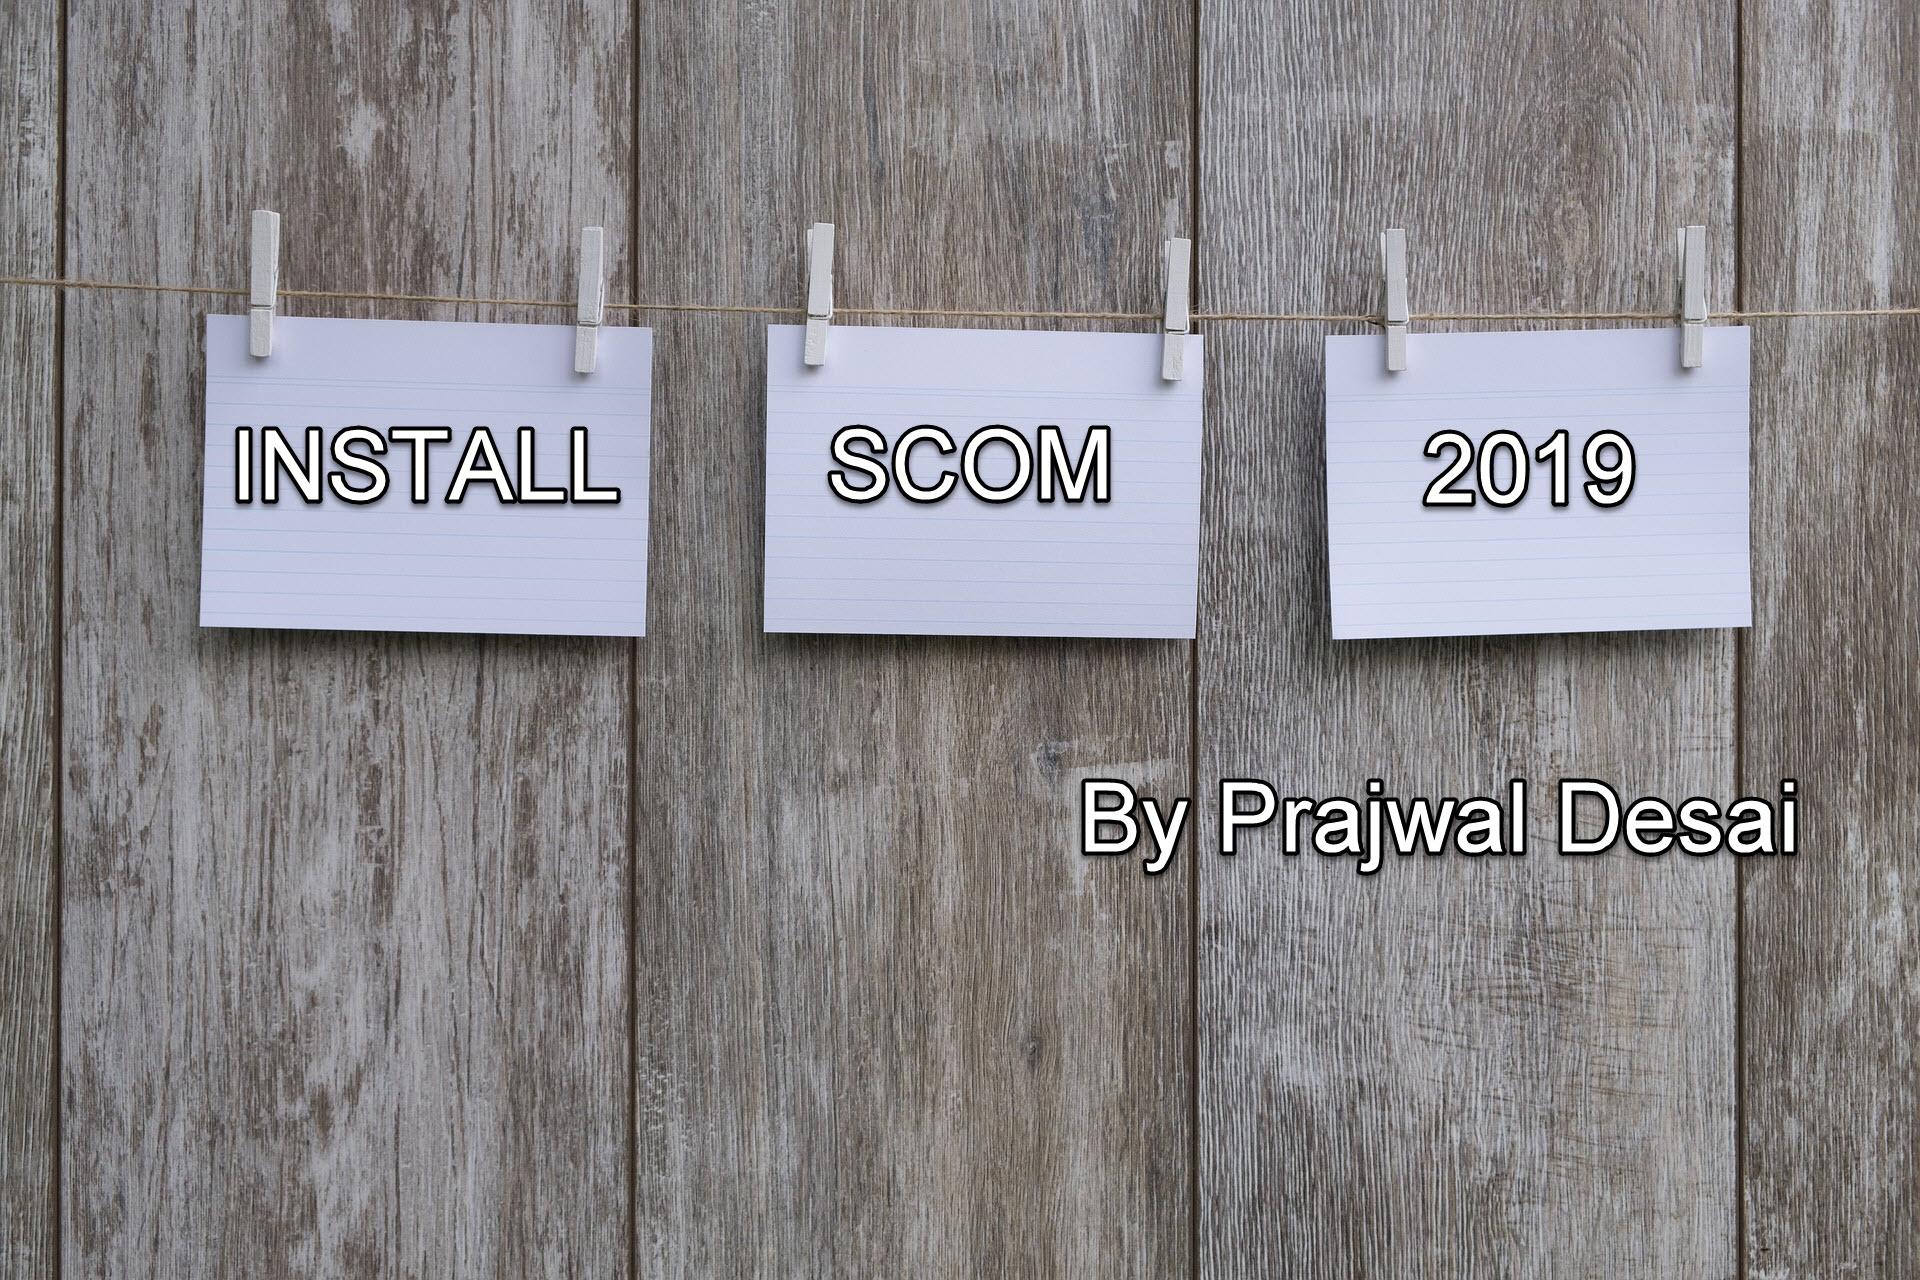 scom 2019 install ftimg